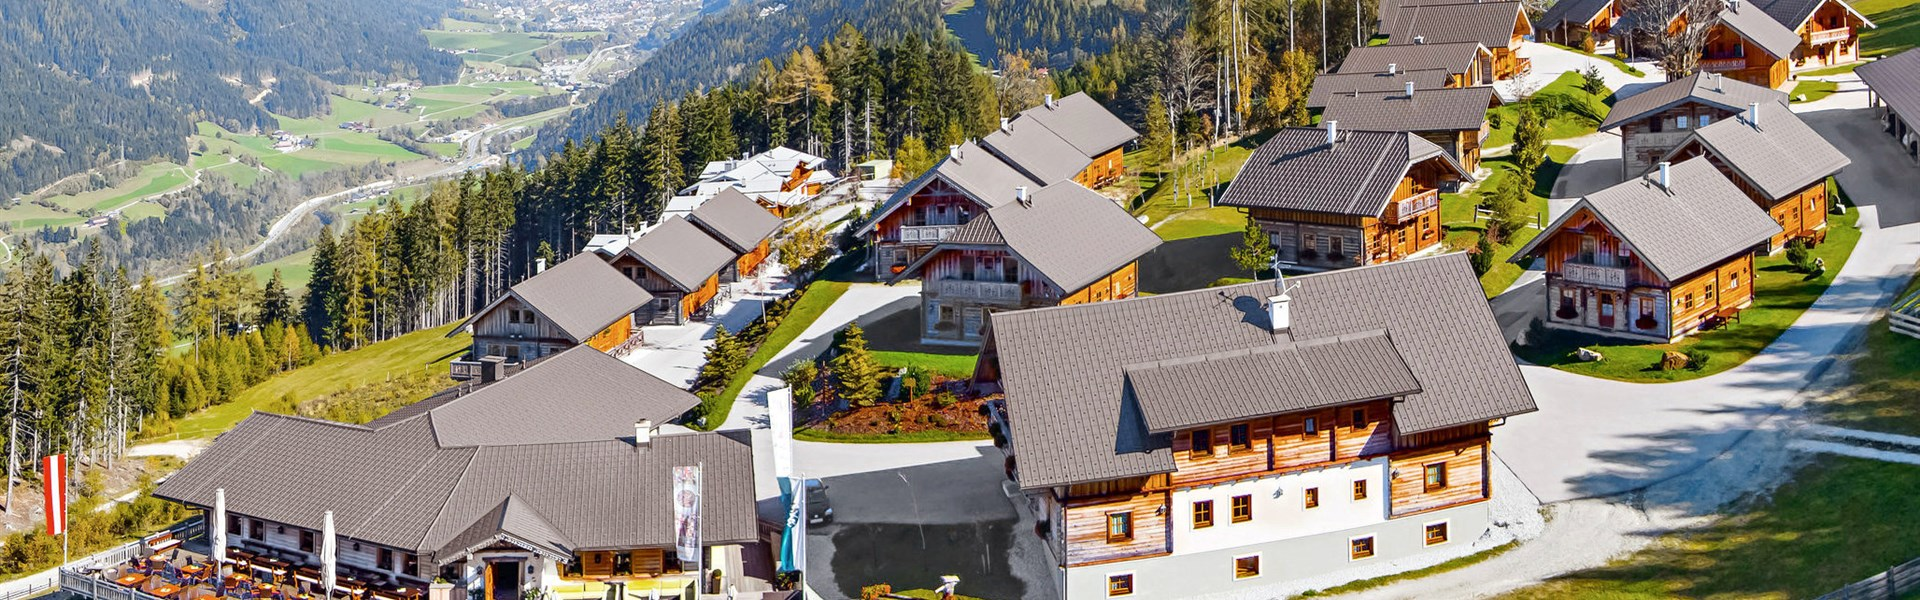 Marco Polo - Hotel Almwelt Austria -